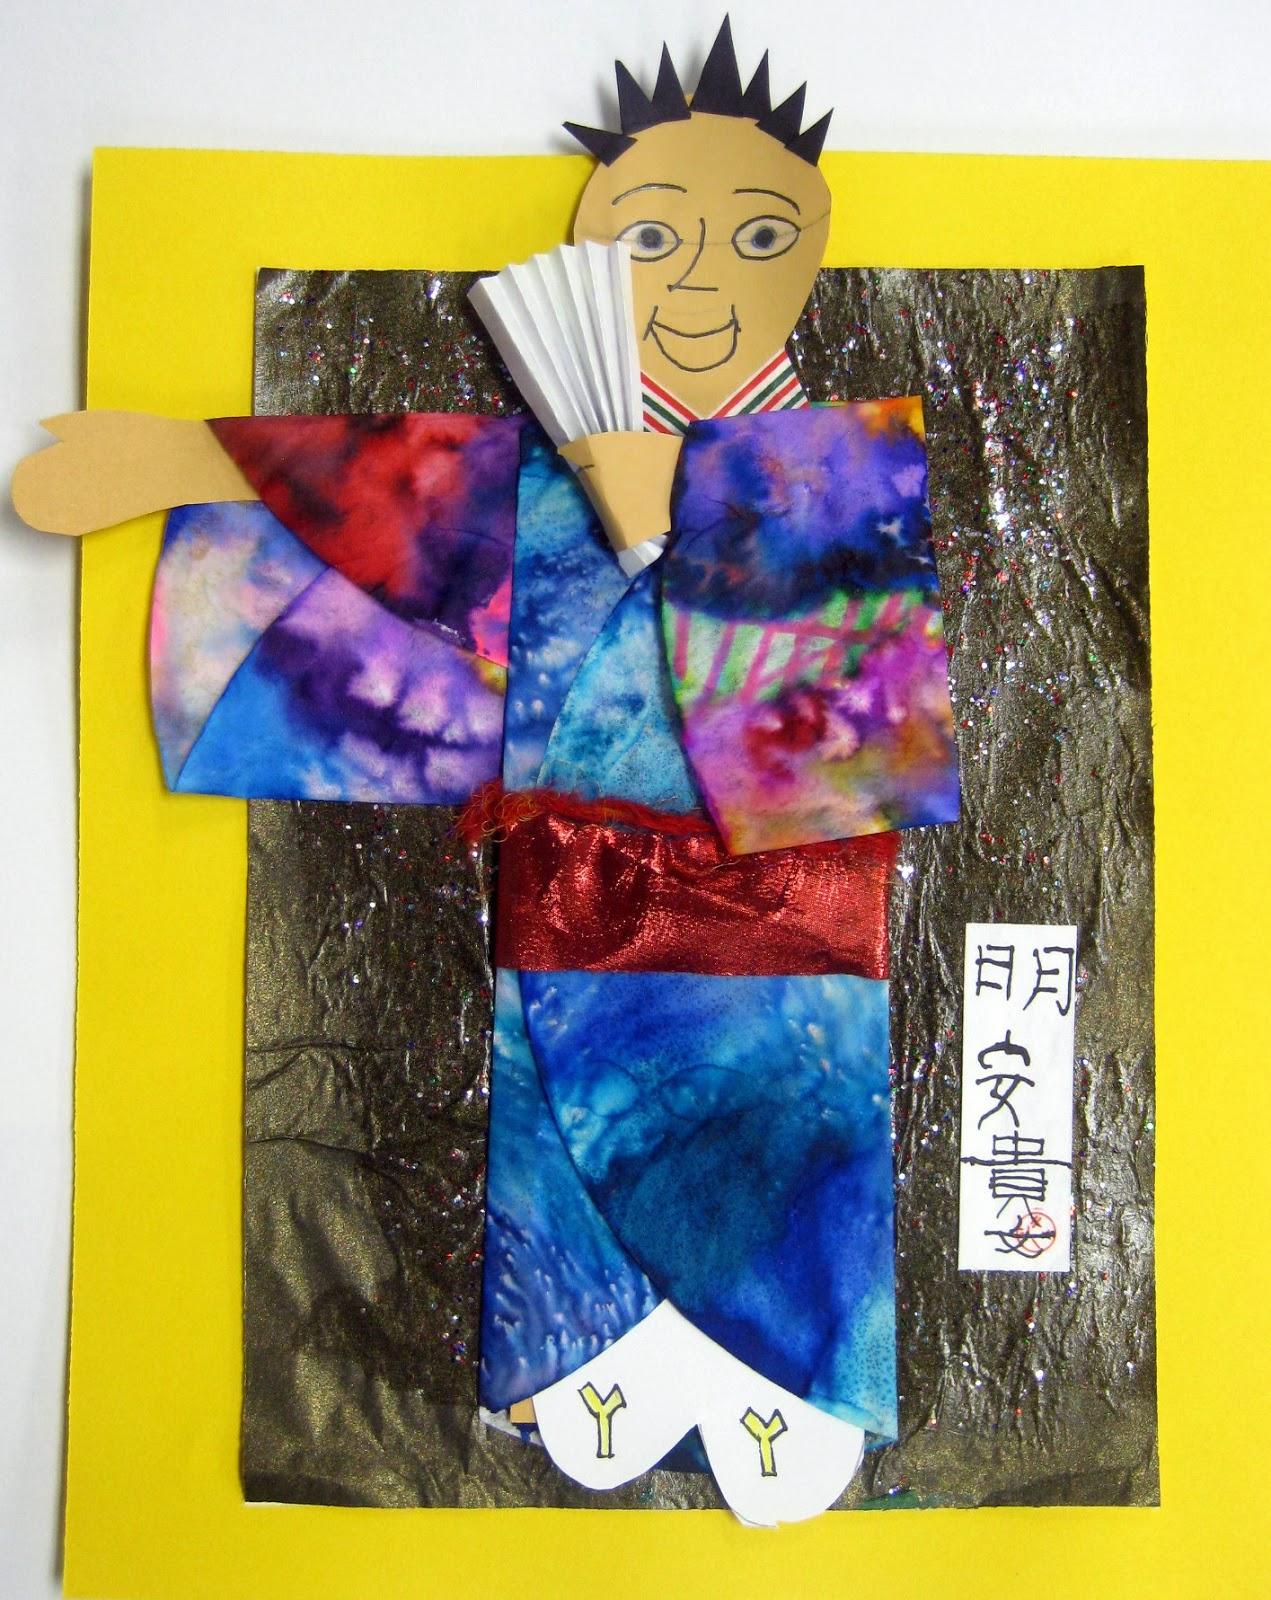 Cassie Stephens In The Art Room Self Portrait In A Kimono